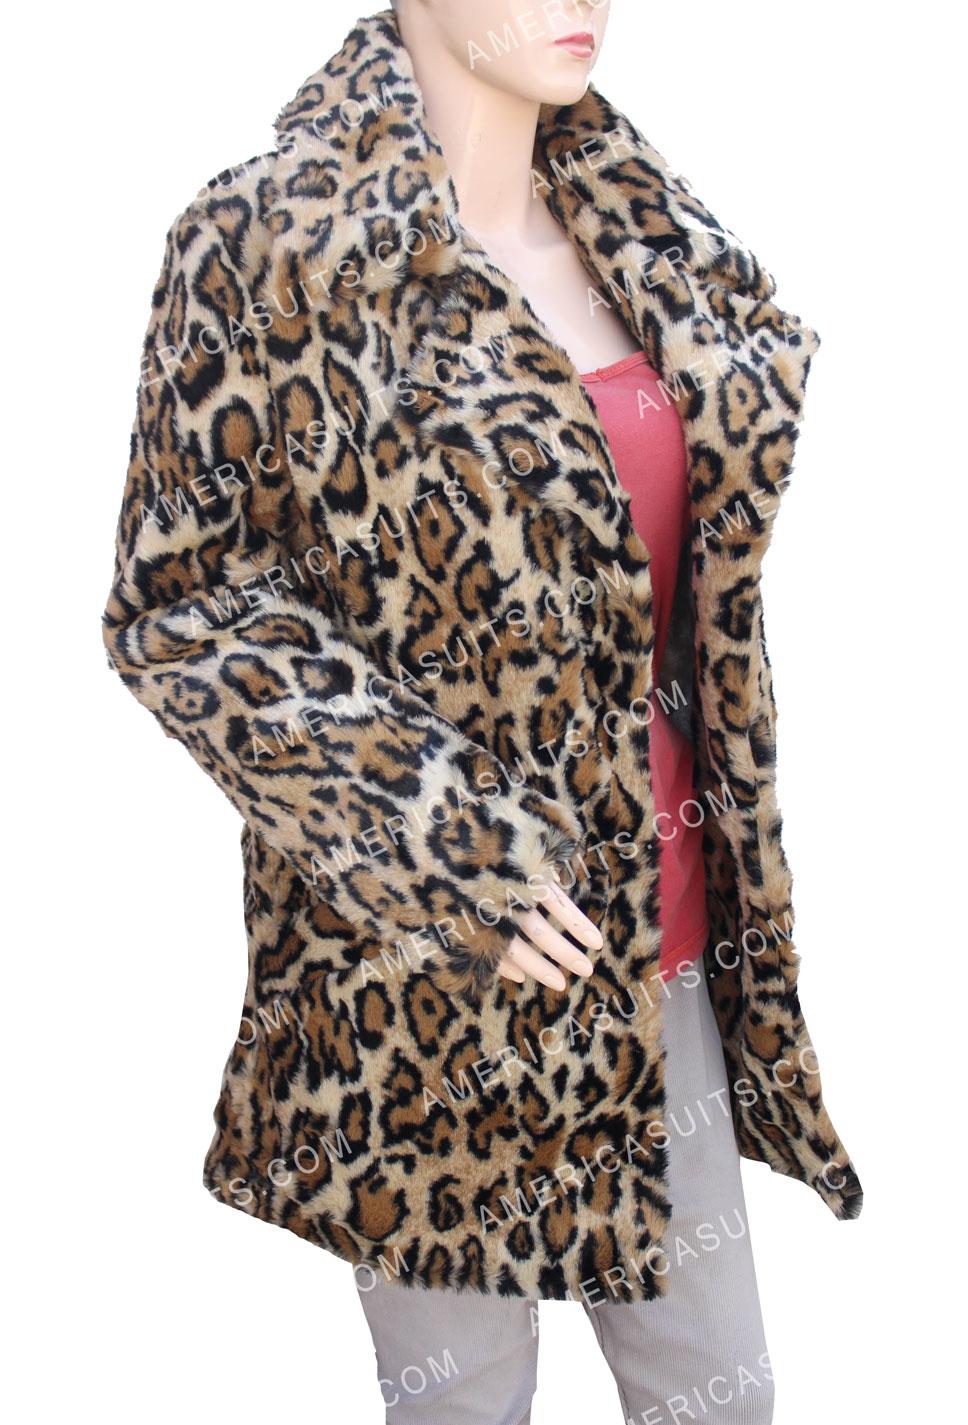 Last Christmas Young Kate Cheetah Print Coat